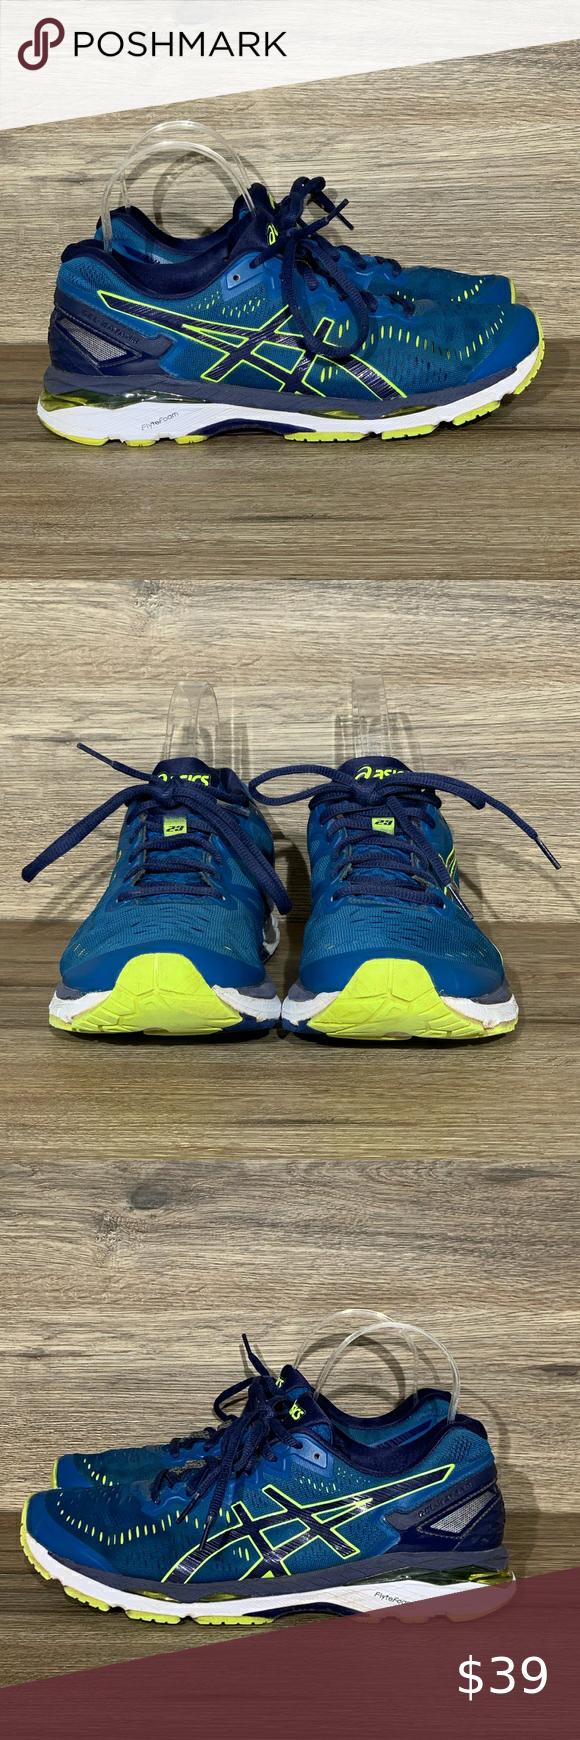 Asics Gel Kayano Running Shoes T646N Mens Size 8.5 | Running shoes ...